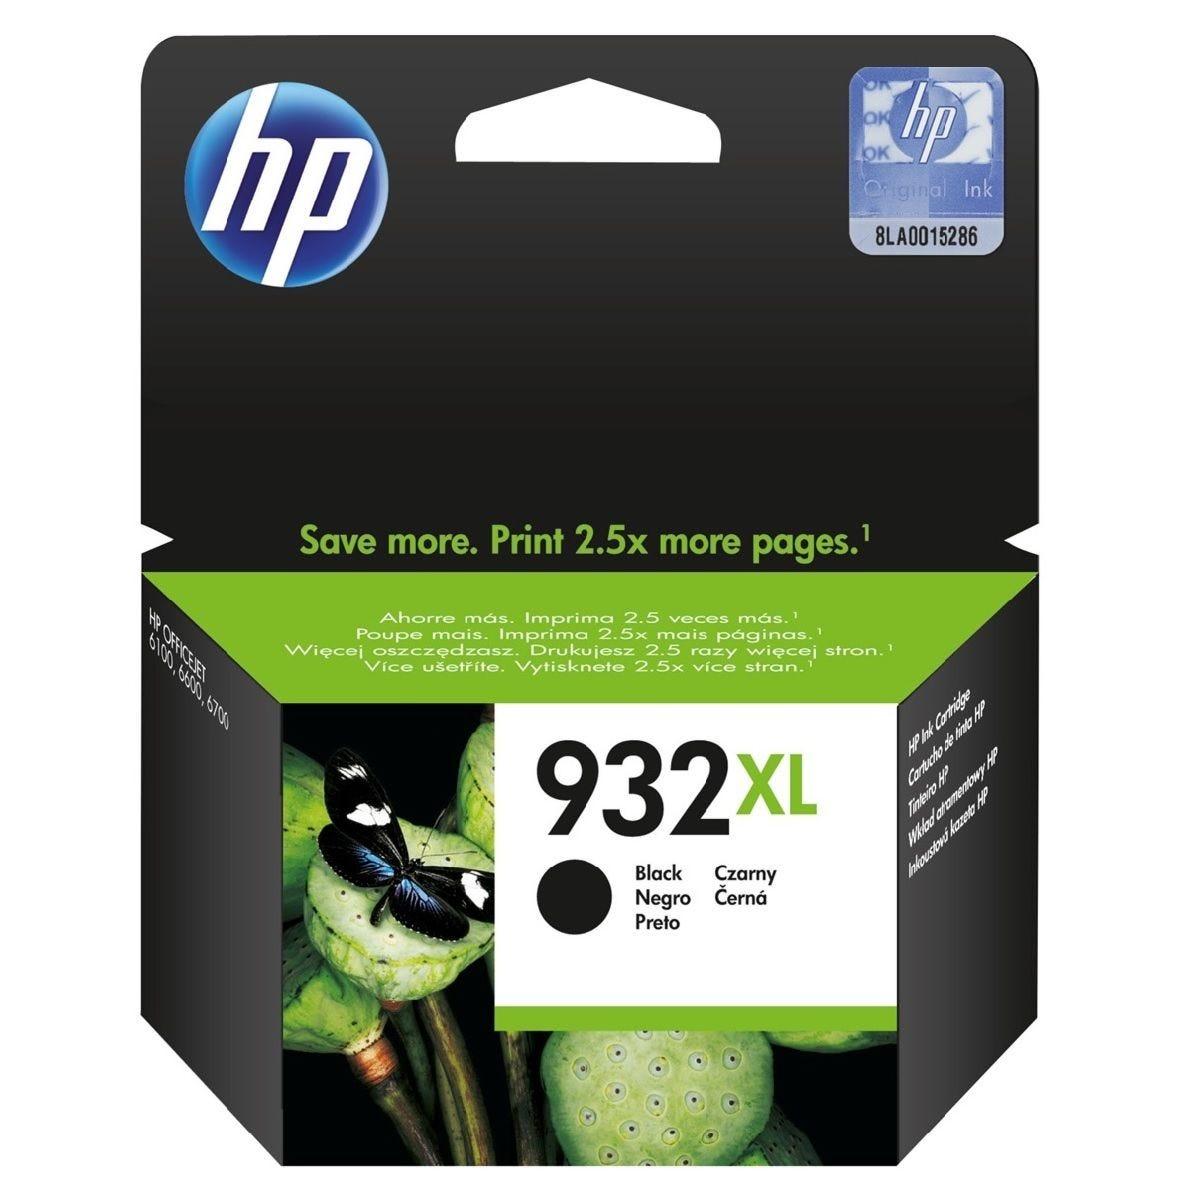 HP Hewlett-Packard 932XL Ink Cartridge - Black